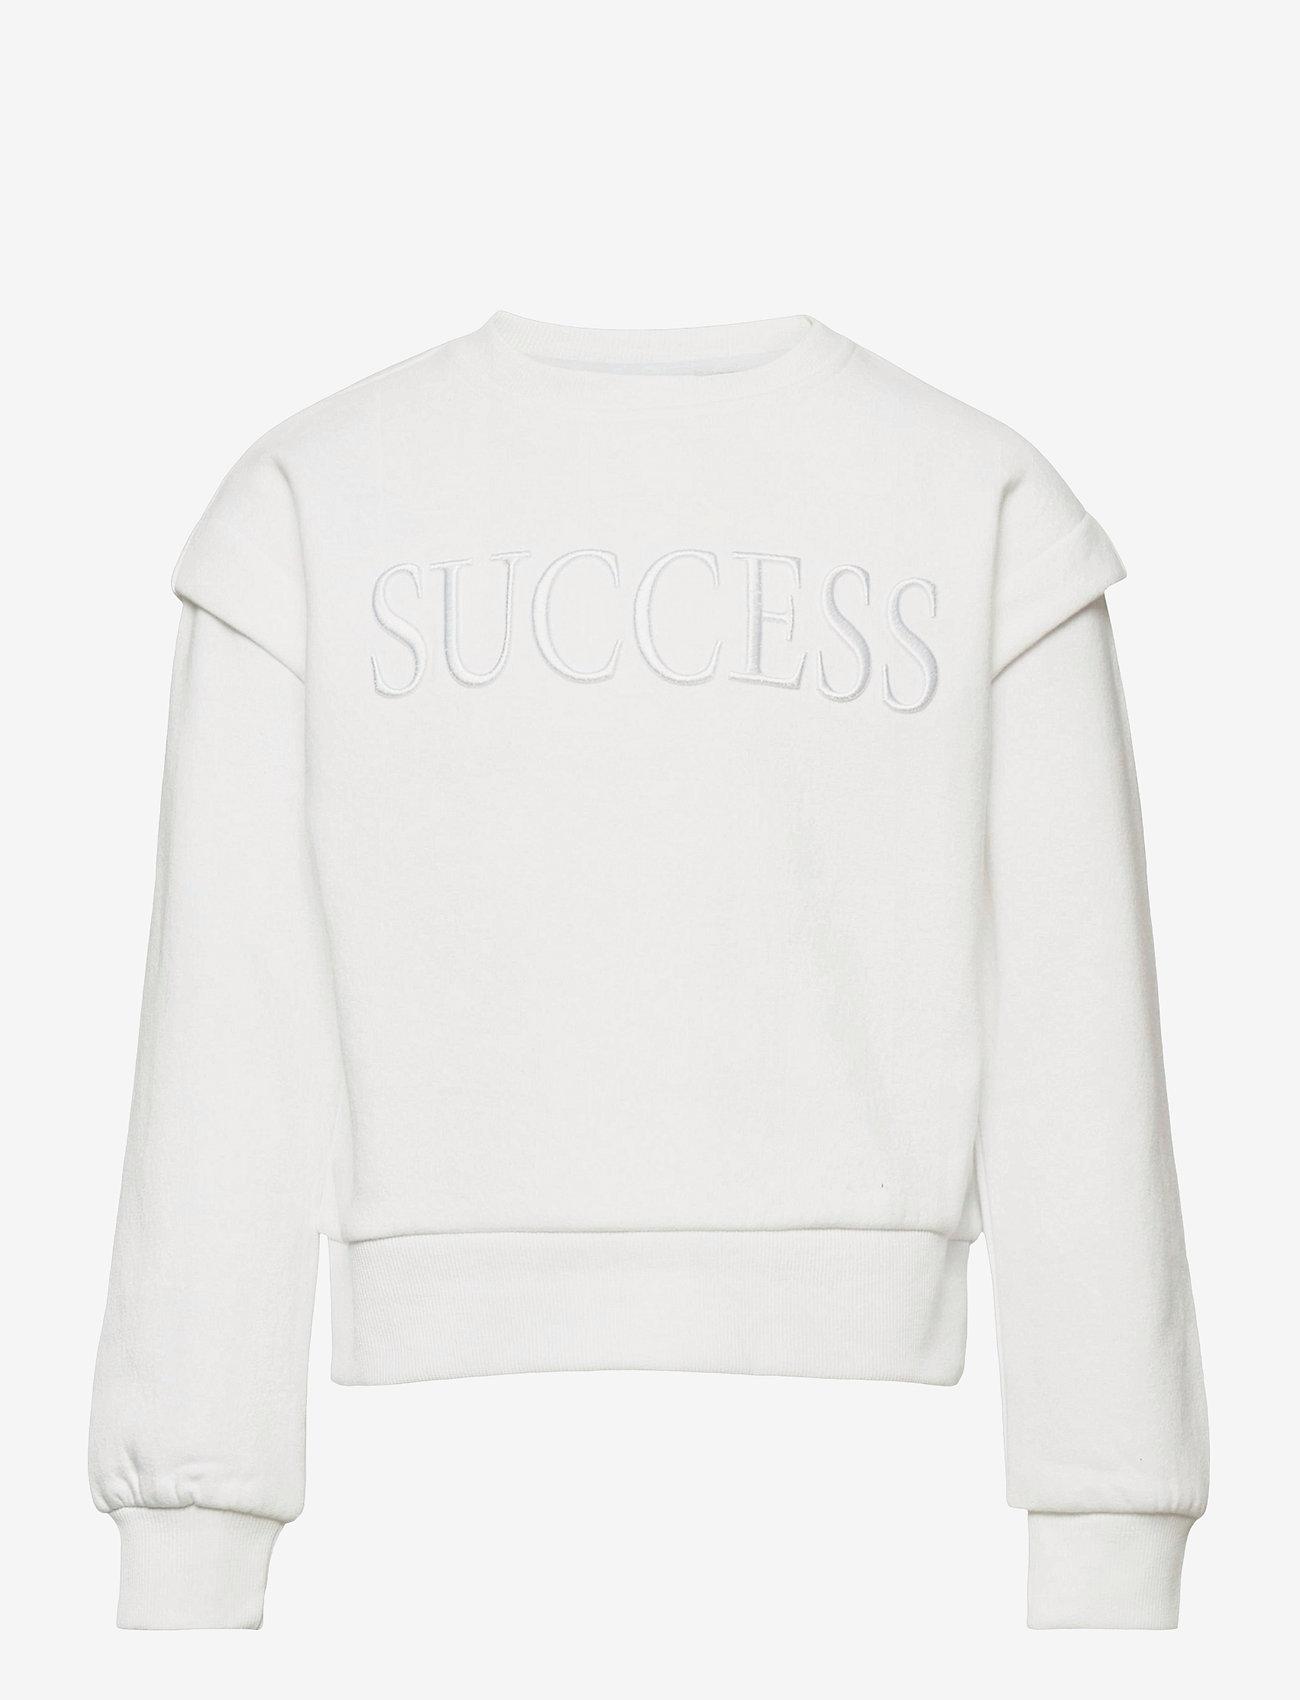 Kids Only - KONELLA L/S O-NECK SWT - sweatshirts - bright white - 0